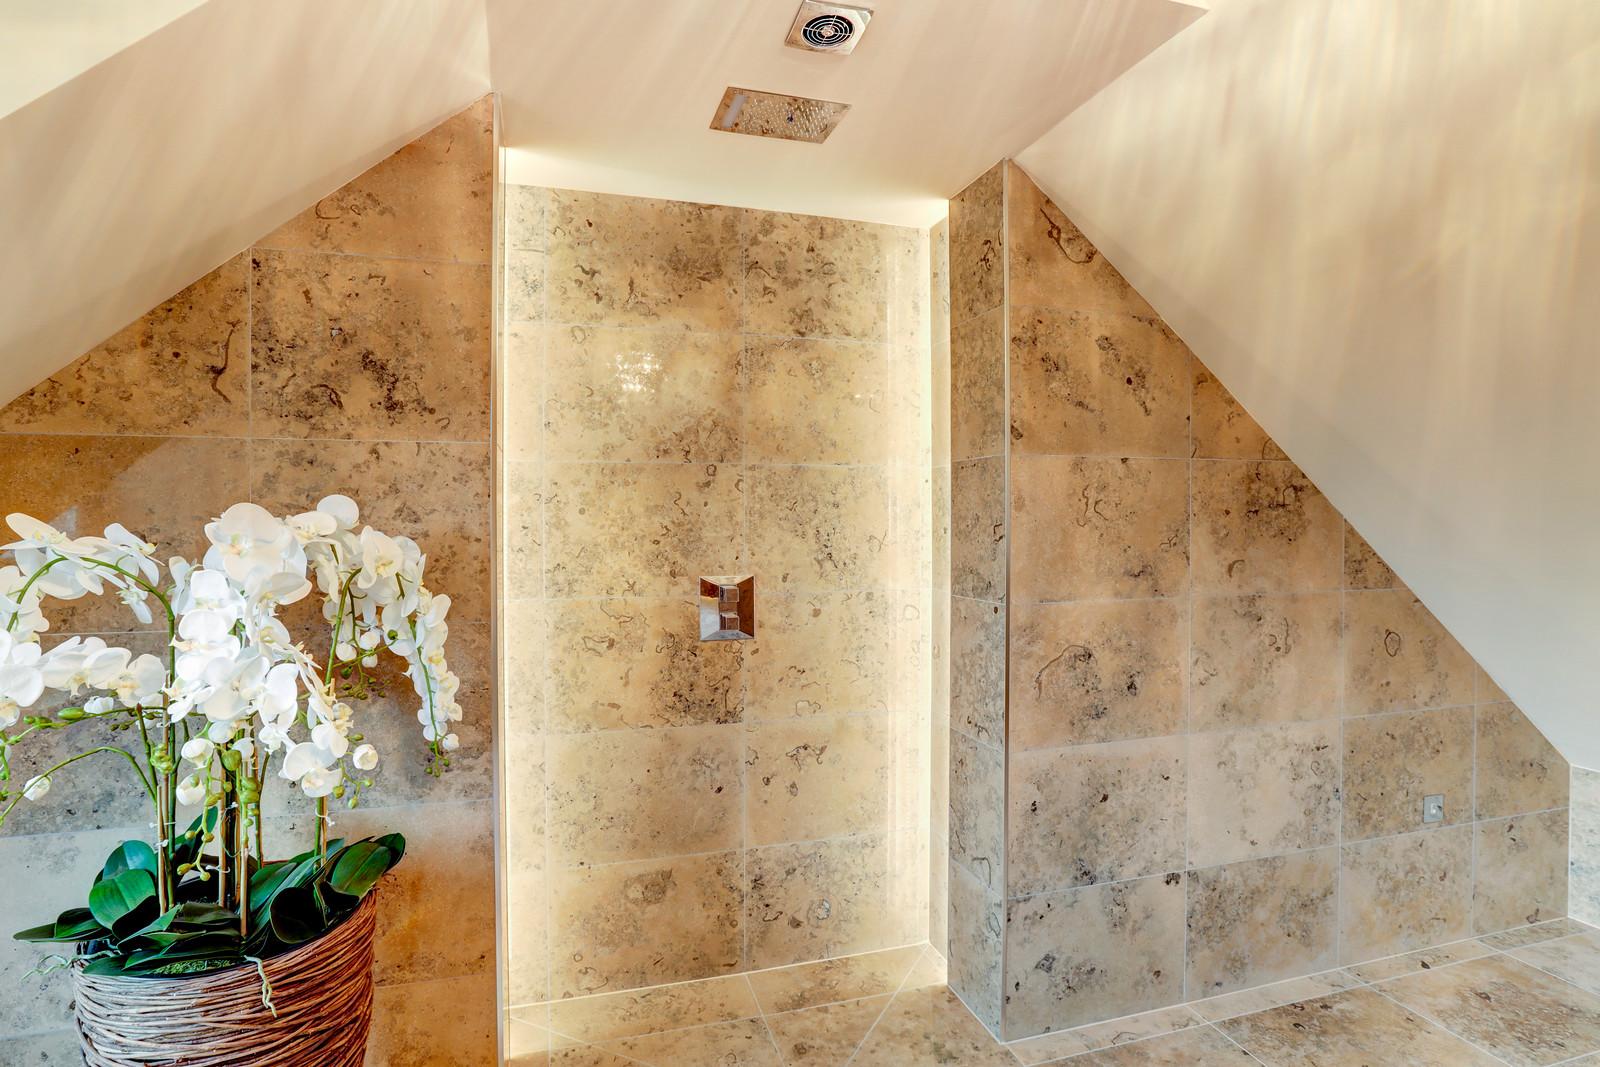 Shower room in Tanglewood, luxury home, Colston Bassett by Guy Phoenix